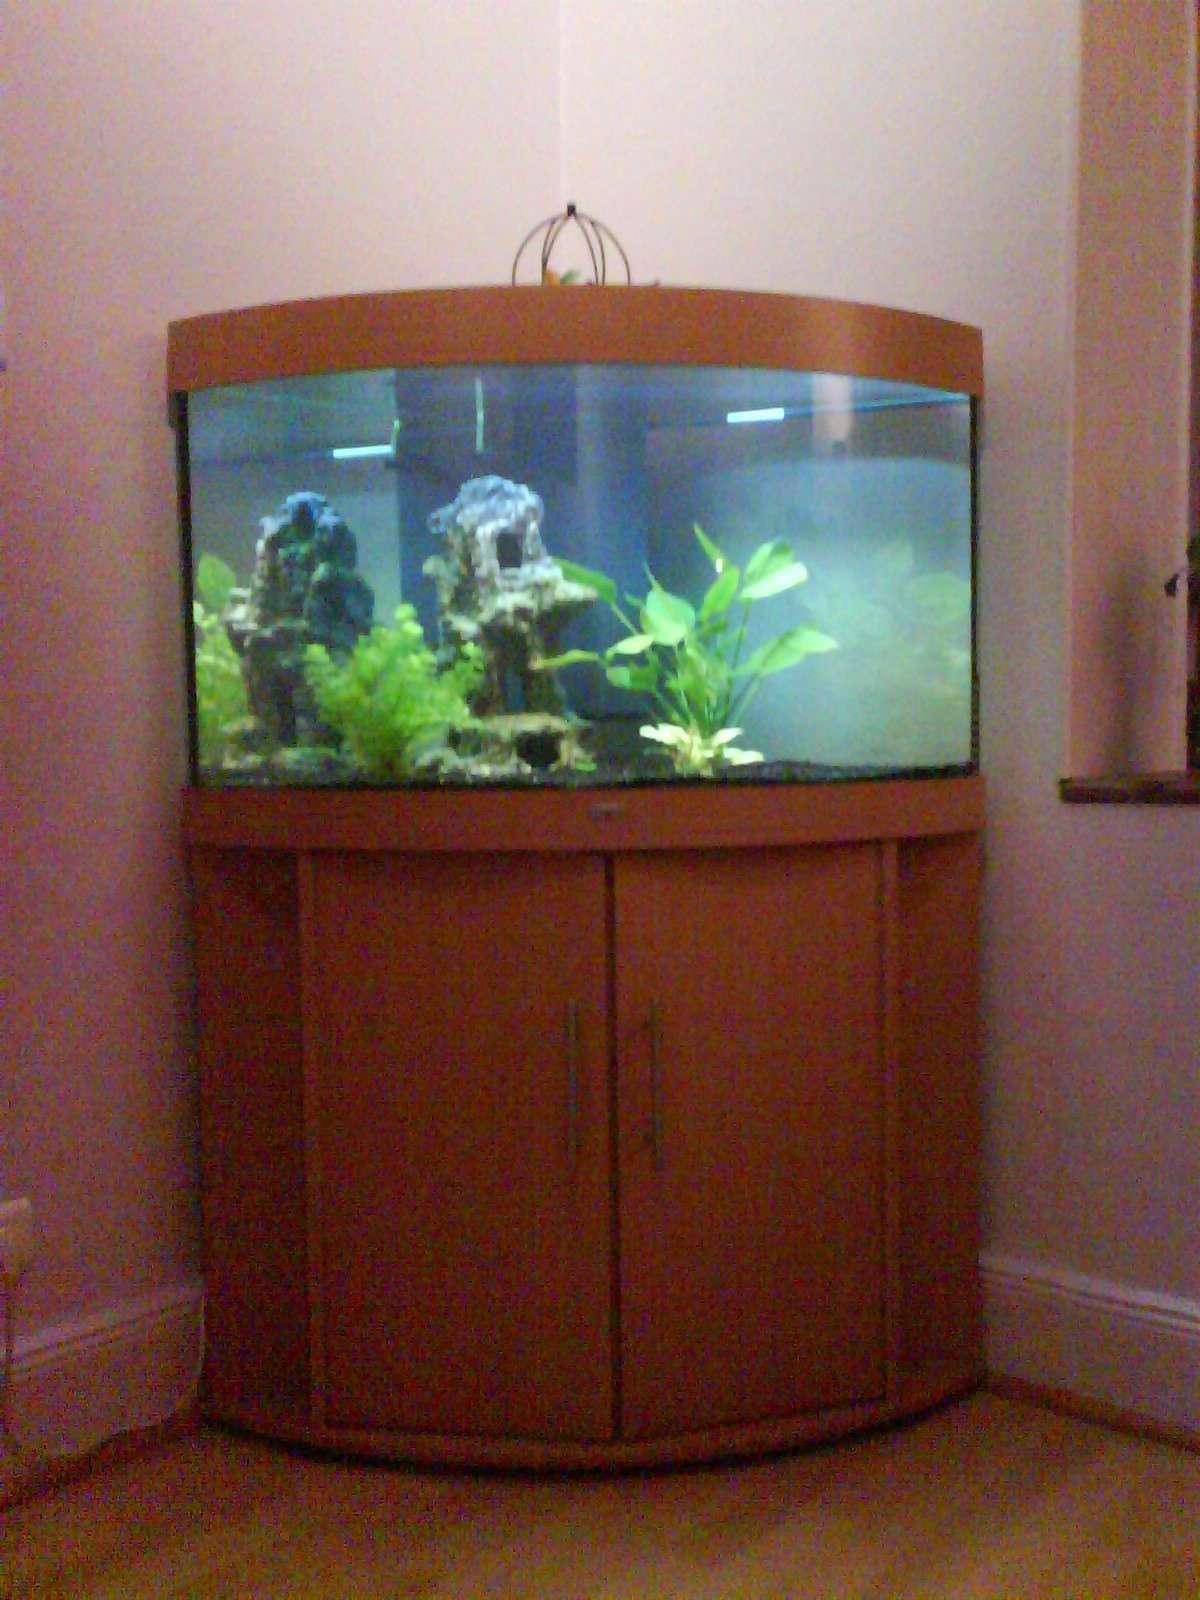 Premier aquarium choisir rio125 rio180 ou aquatlantis 101 for Prix aquarium rond